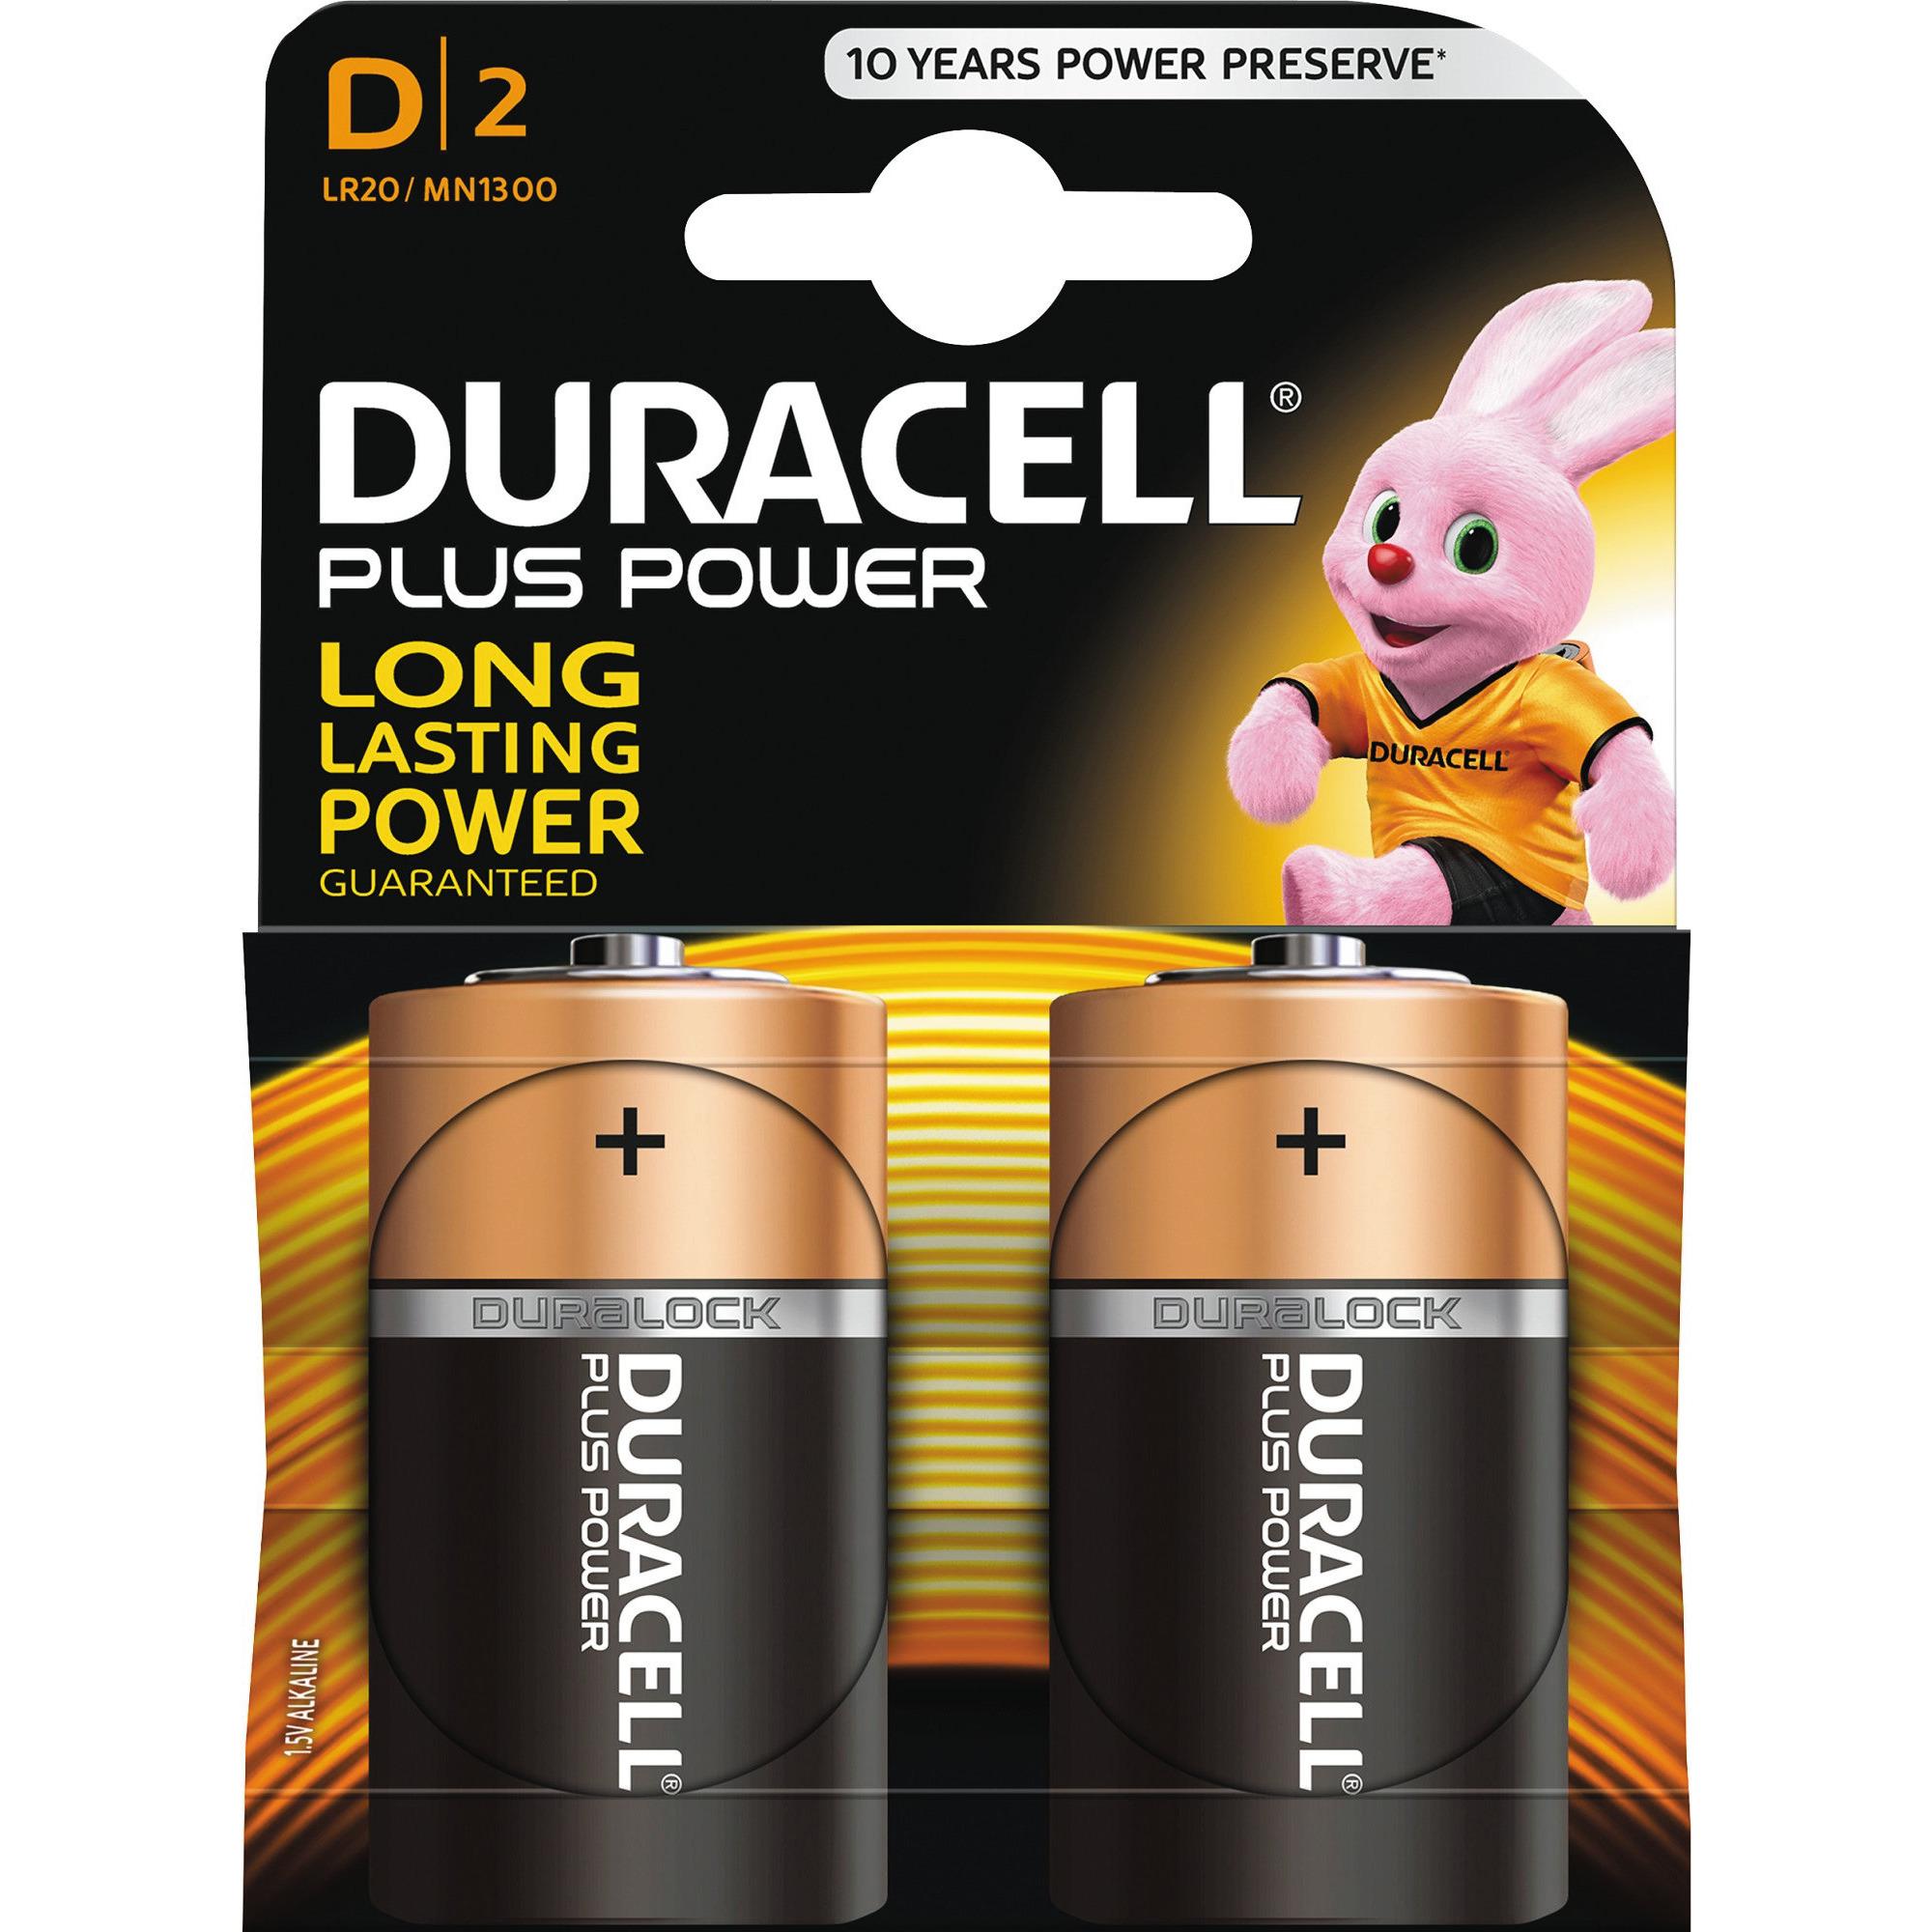 Duracell Plus Power MN1500 Alkaline AA 8 st Batterier